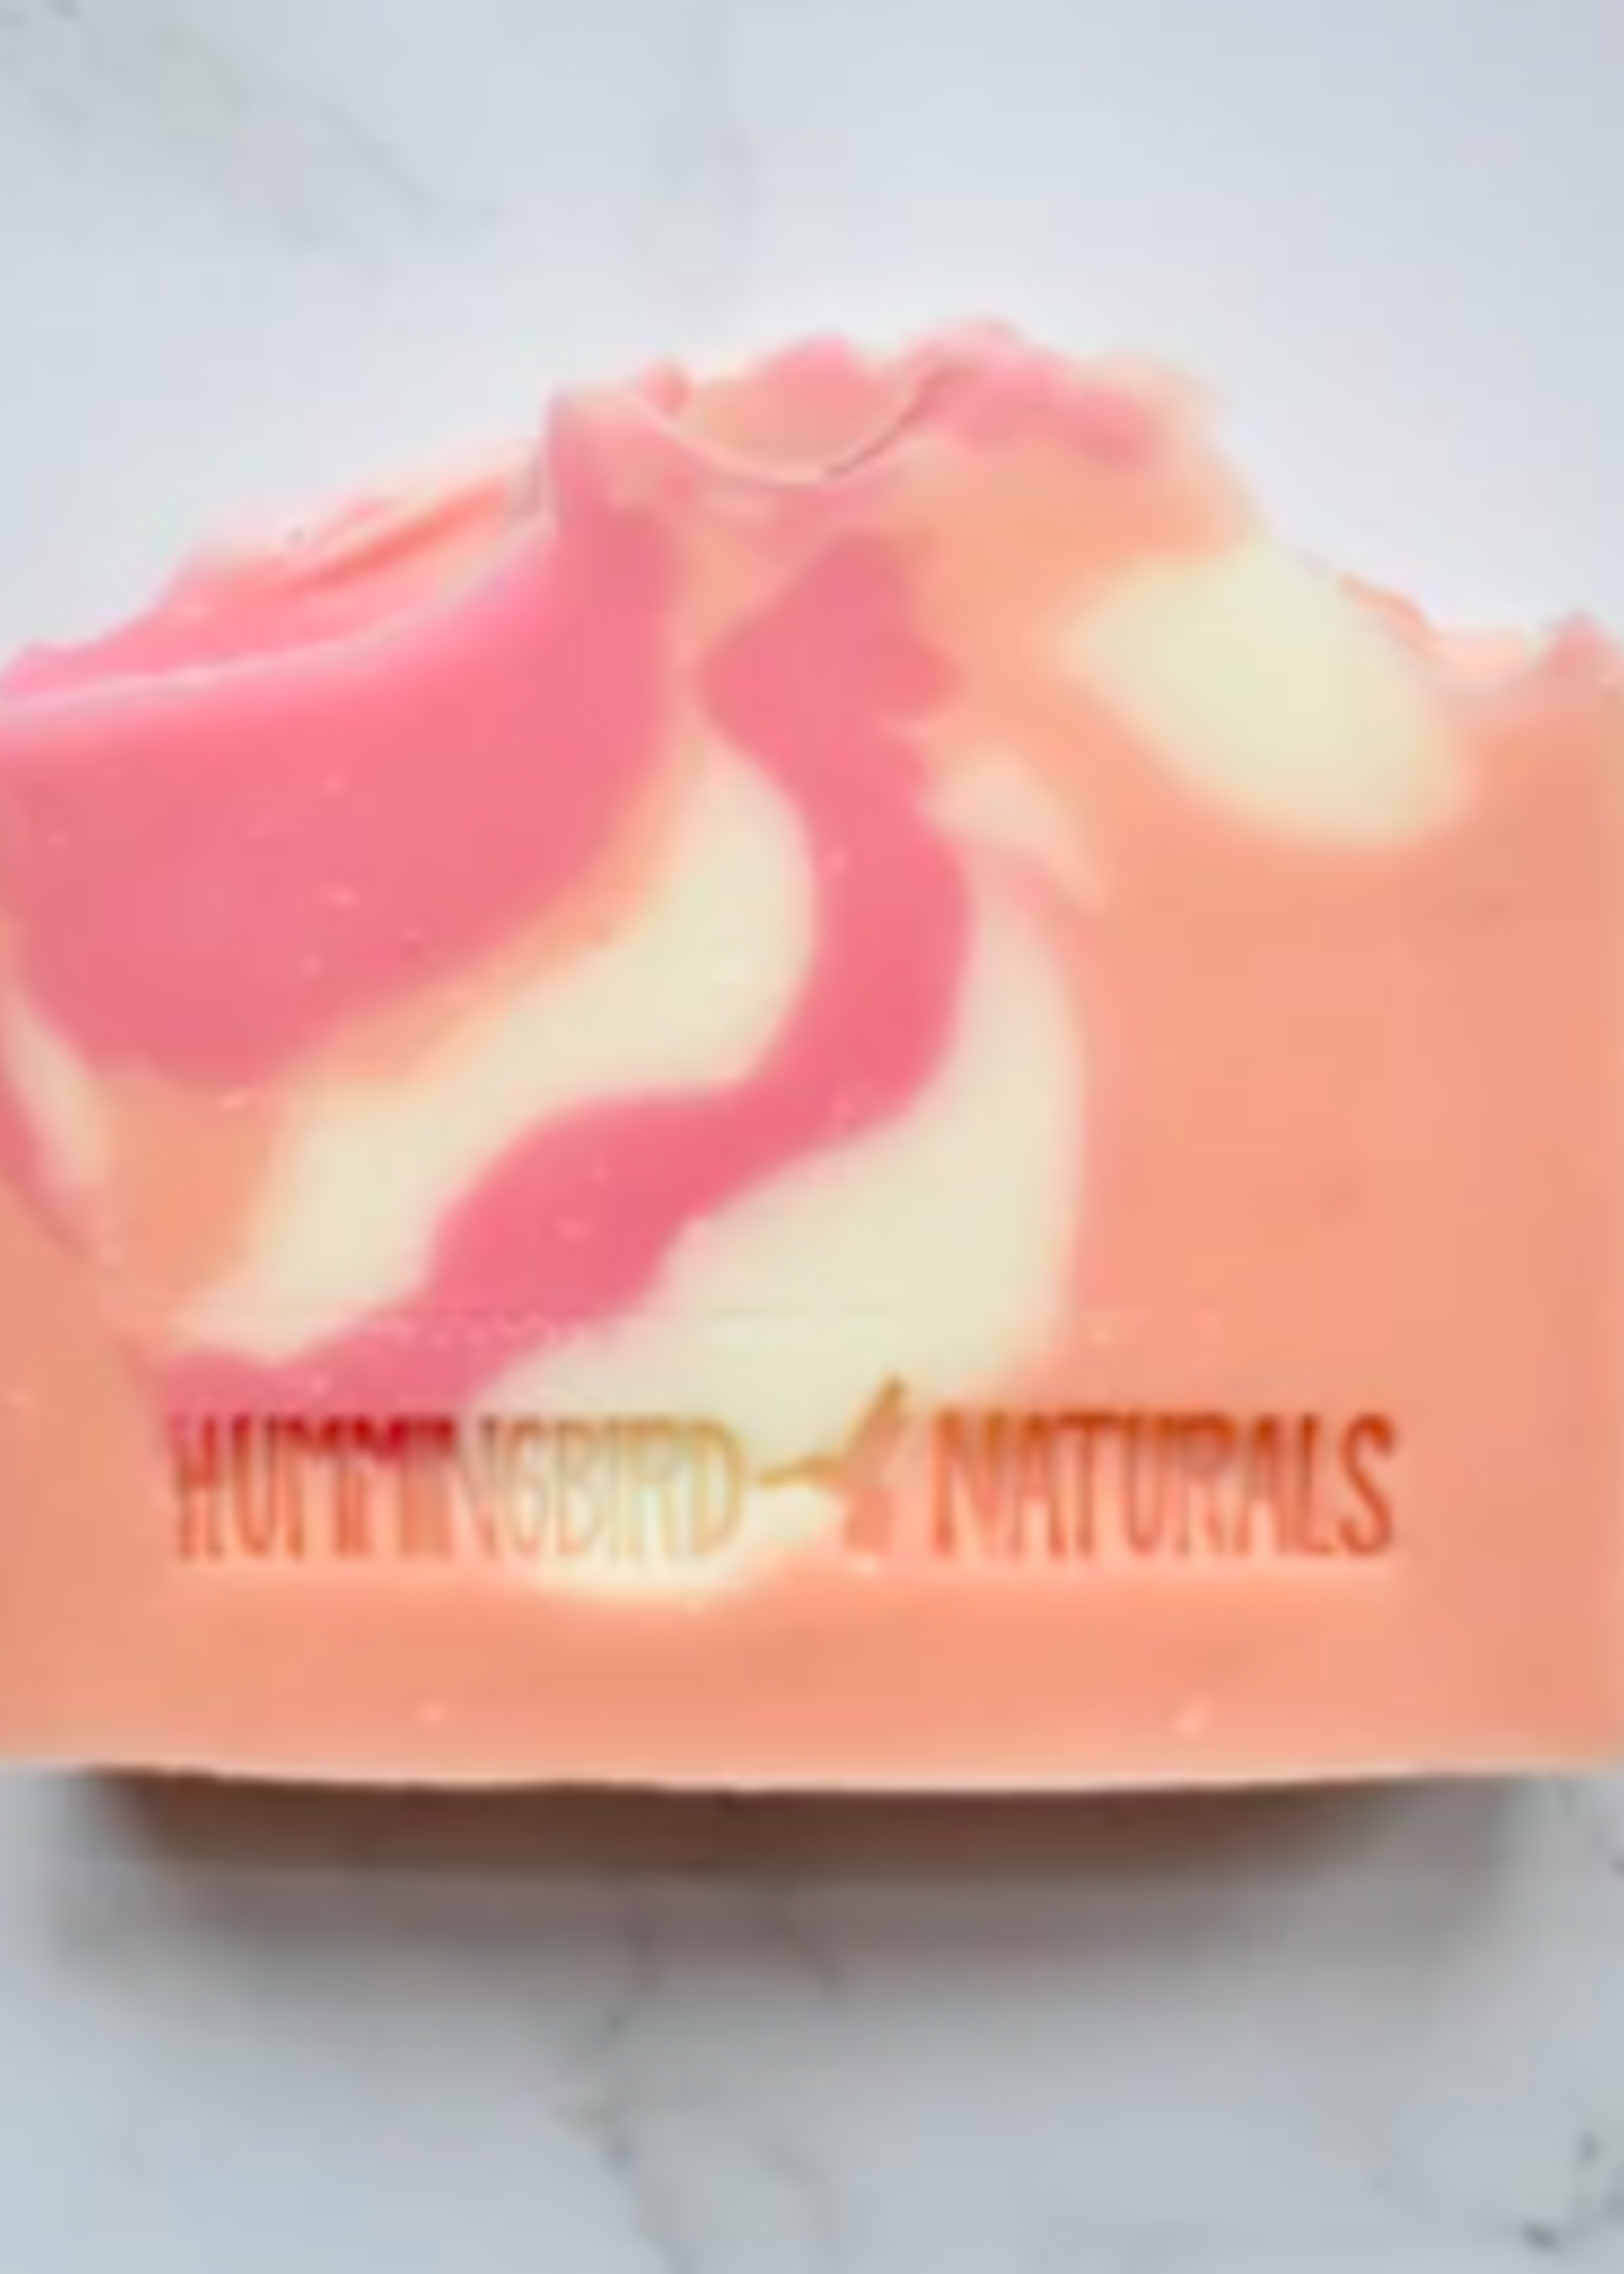 Hummingbird Naturals Pink Grapefruit Soap